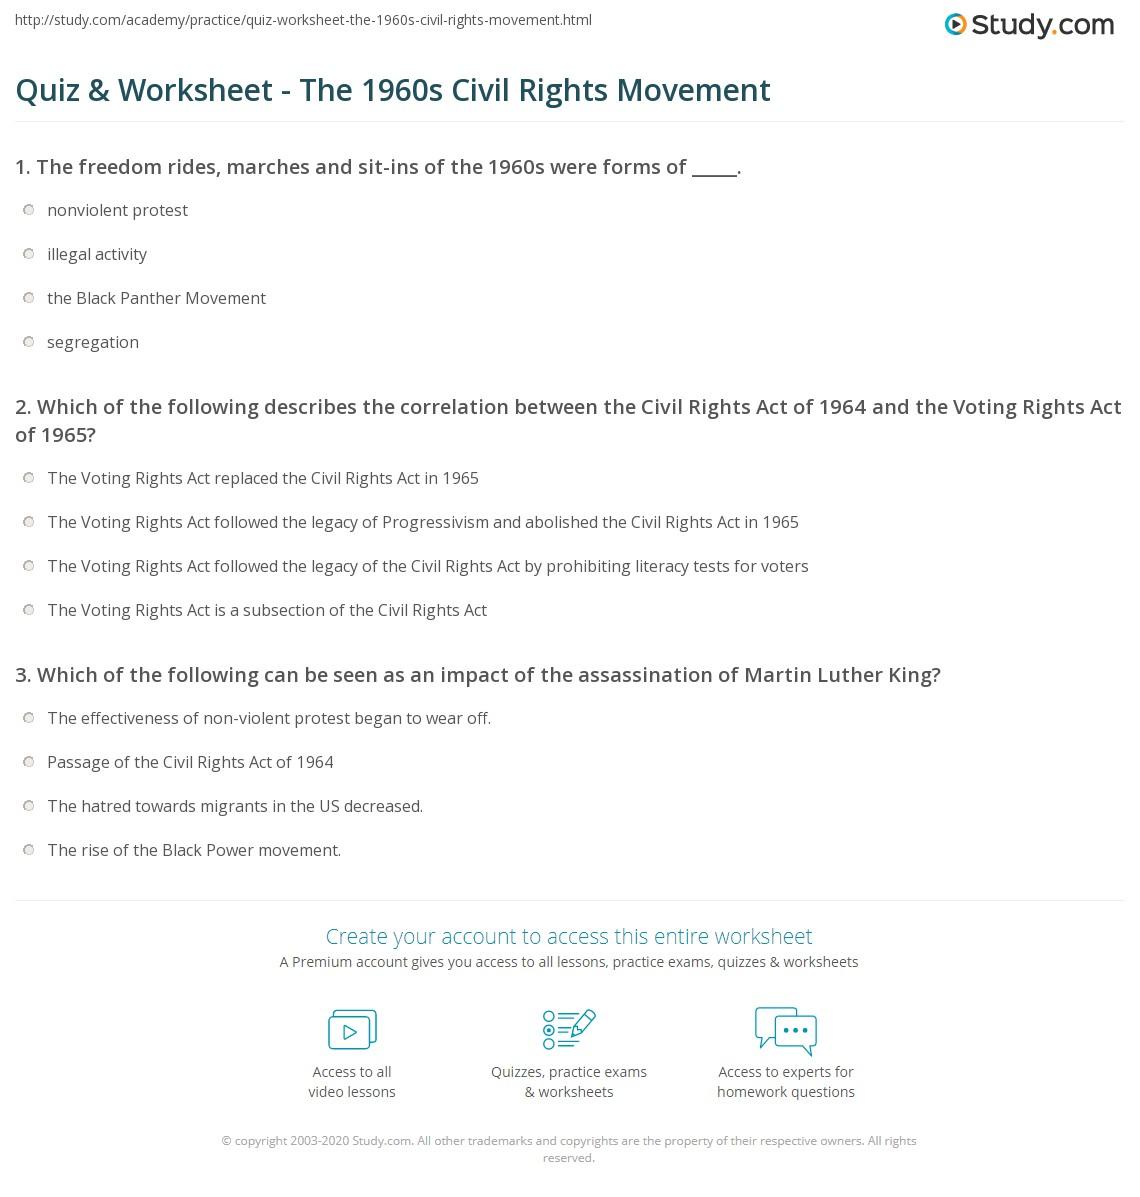 worksheet Civil Rights Movement Worksheets quiz worksheet the 1960s civil rights movement study com print during worksheet